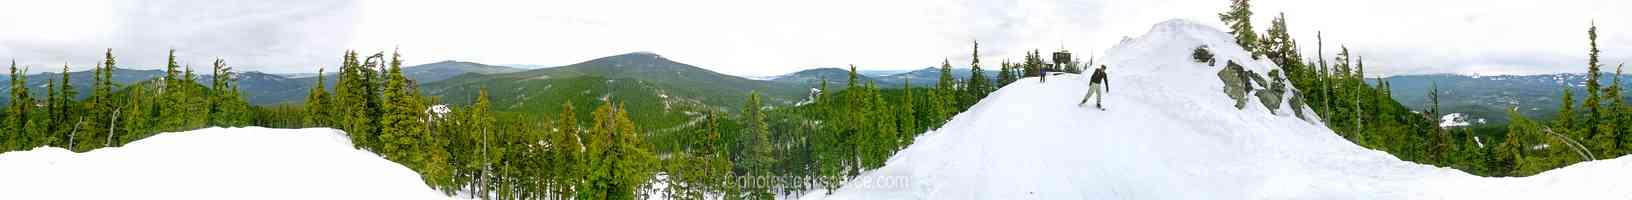 Willamette Pass Eagle Peak